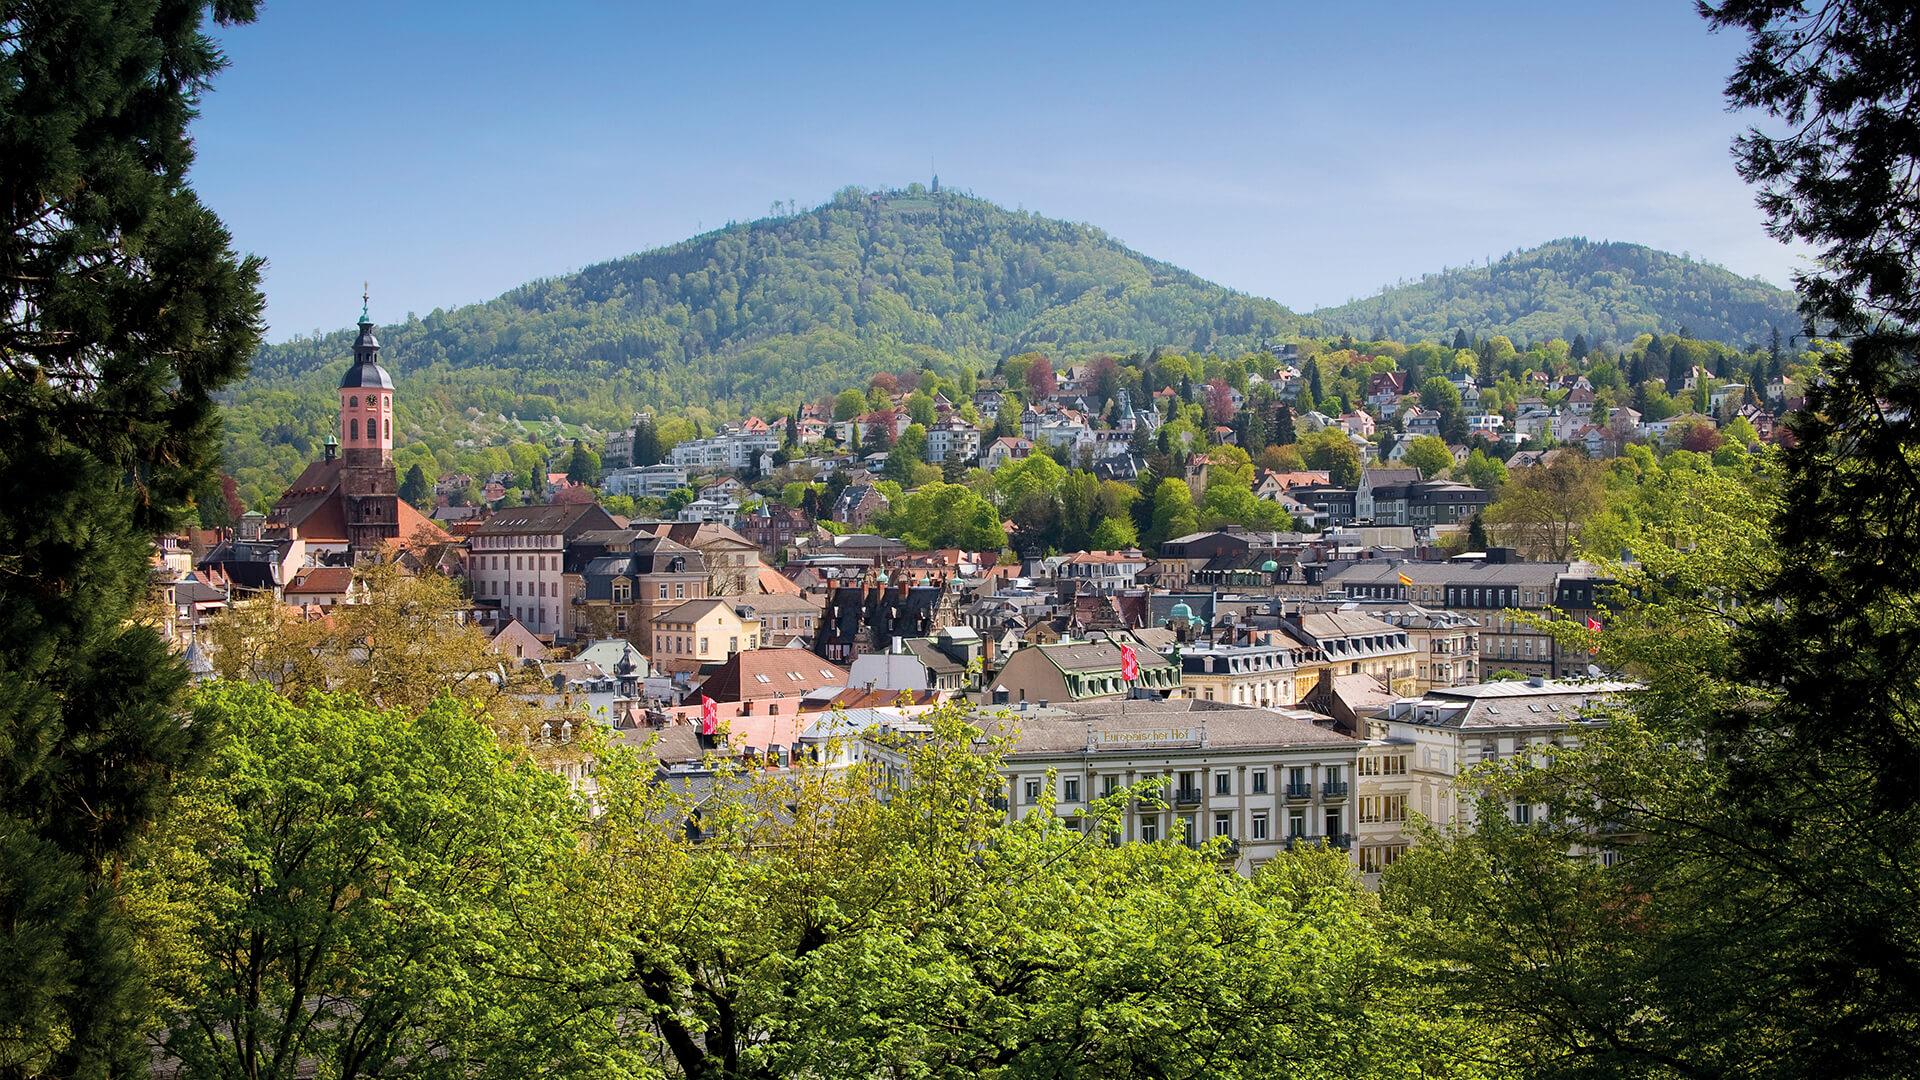 Baden-Baden Tourism Board